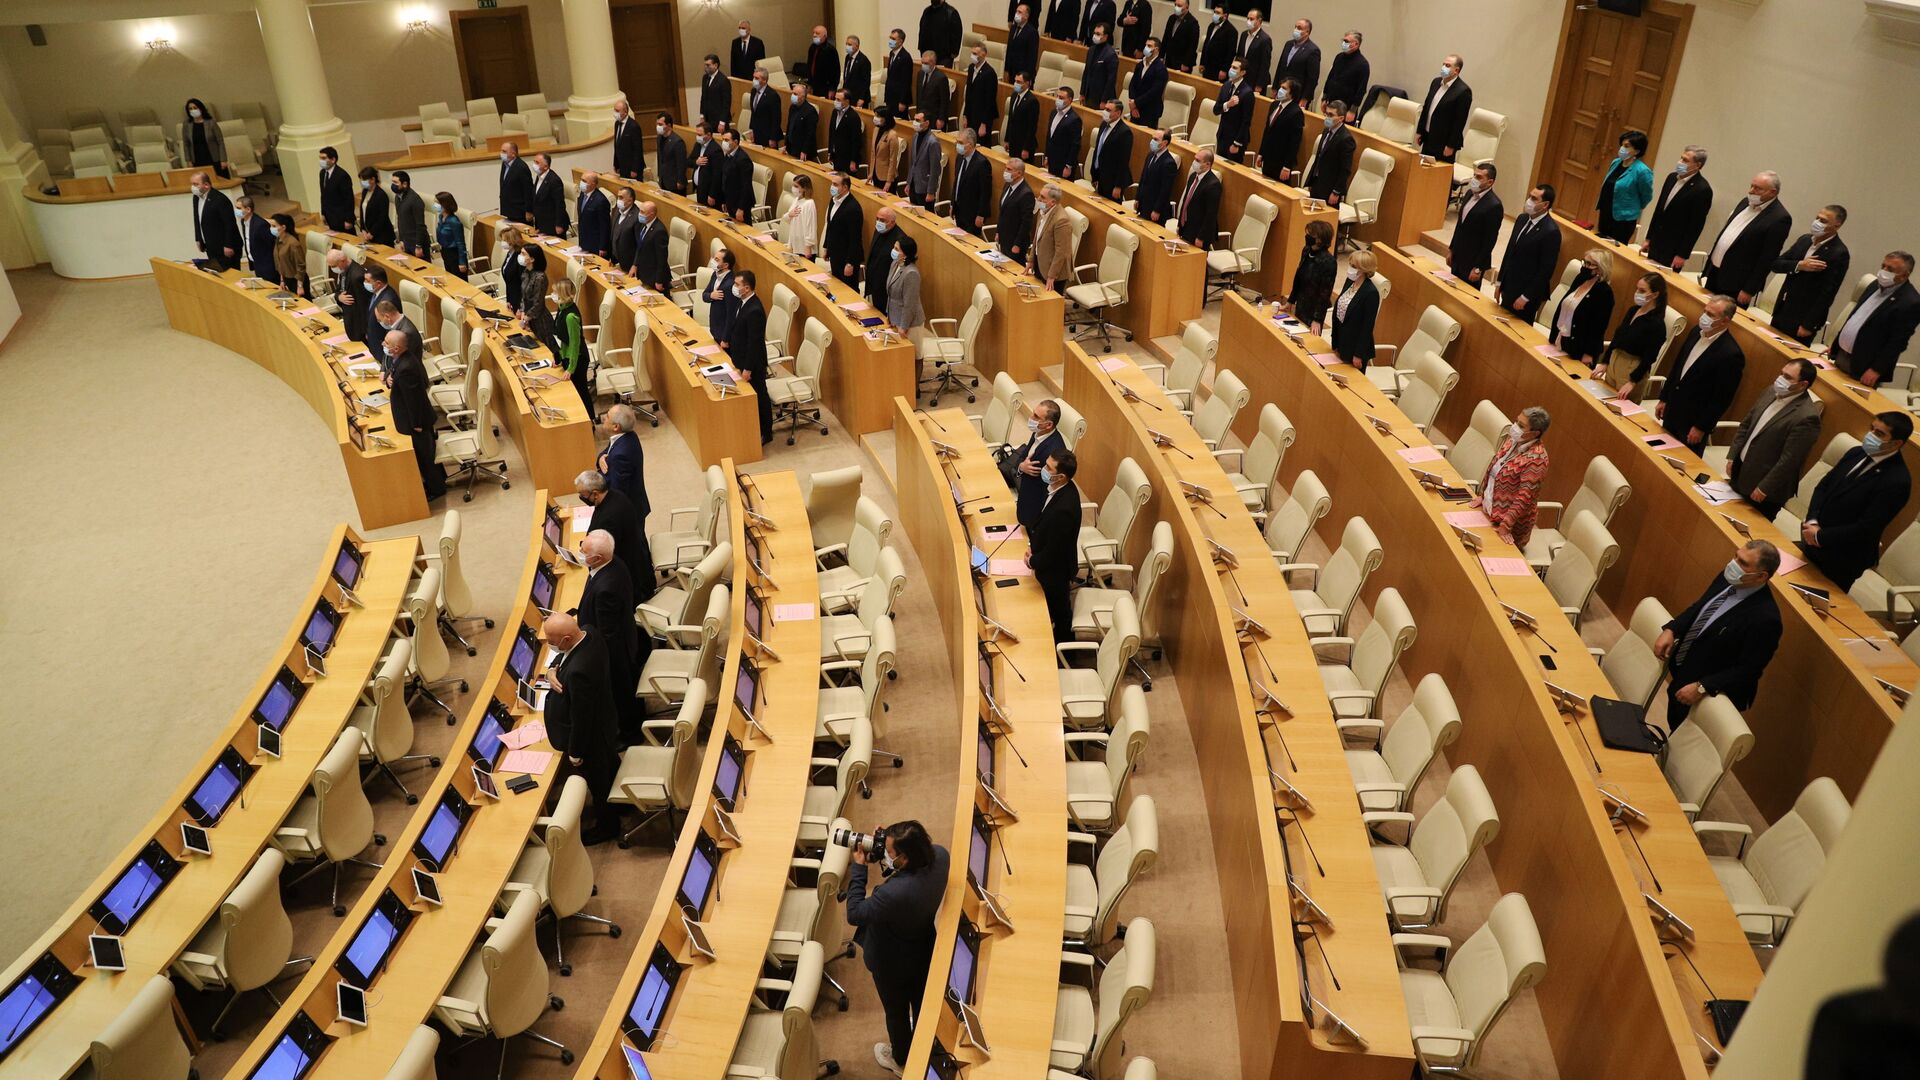 Парламент Грузии - начало заседания - Sputnik Грузия, 1920, 02.02.2021